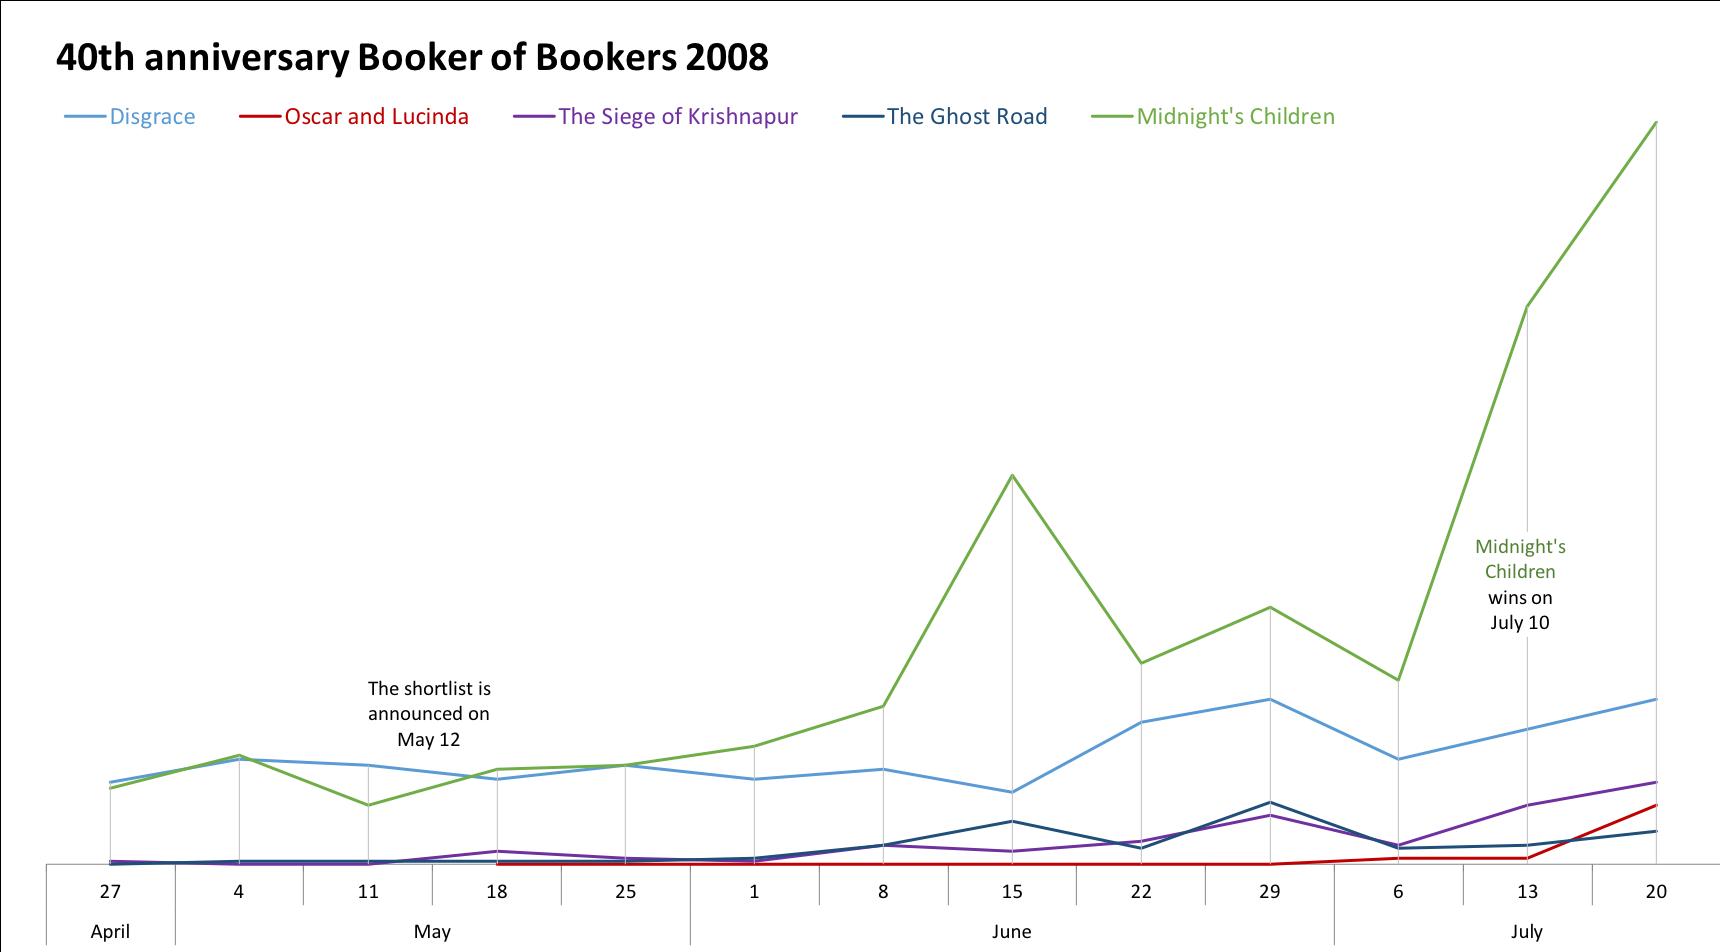 40th anniversary Booker of Bookers 2008 shortlist sales comparison